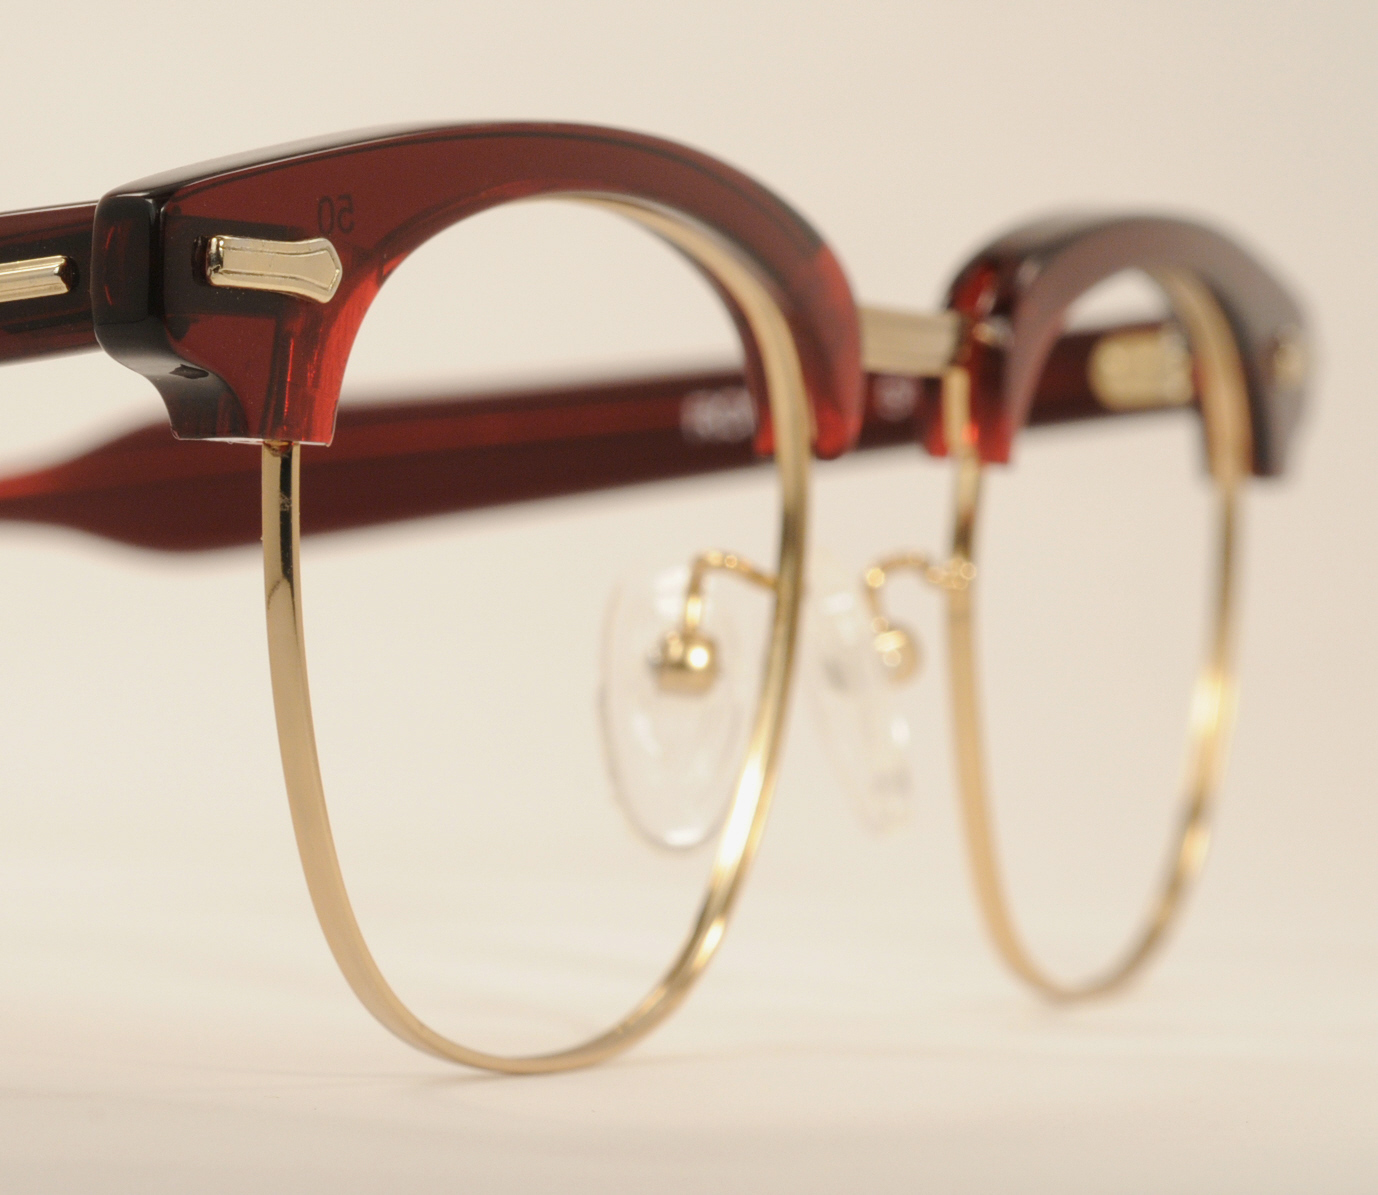 Optometrist Attic - SHURON RONSIR ZYL G-MAN CORDOVA ...